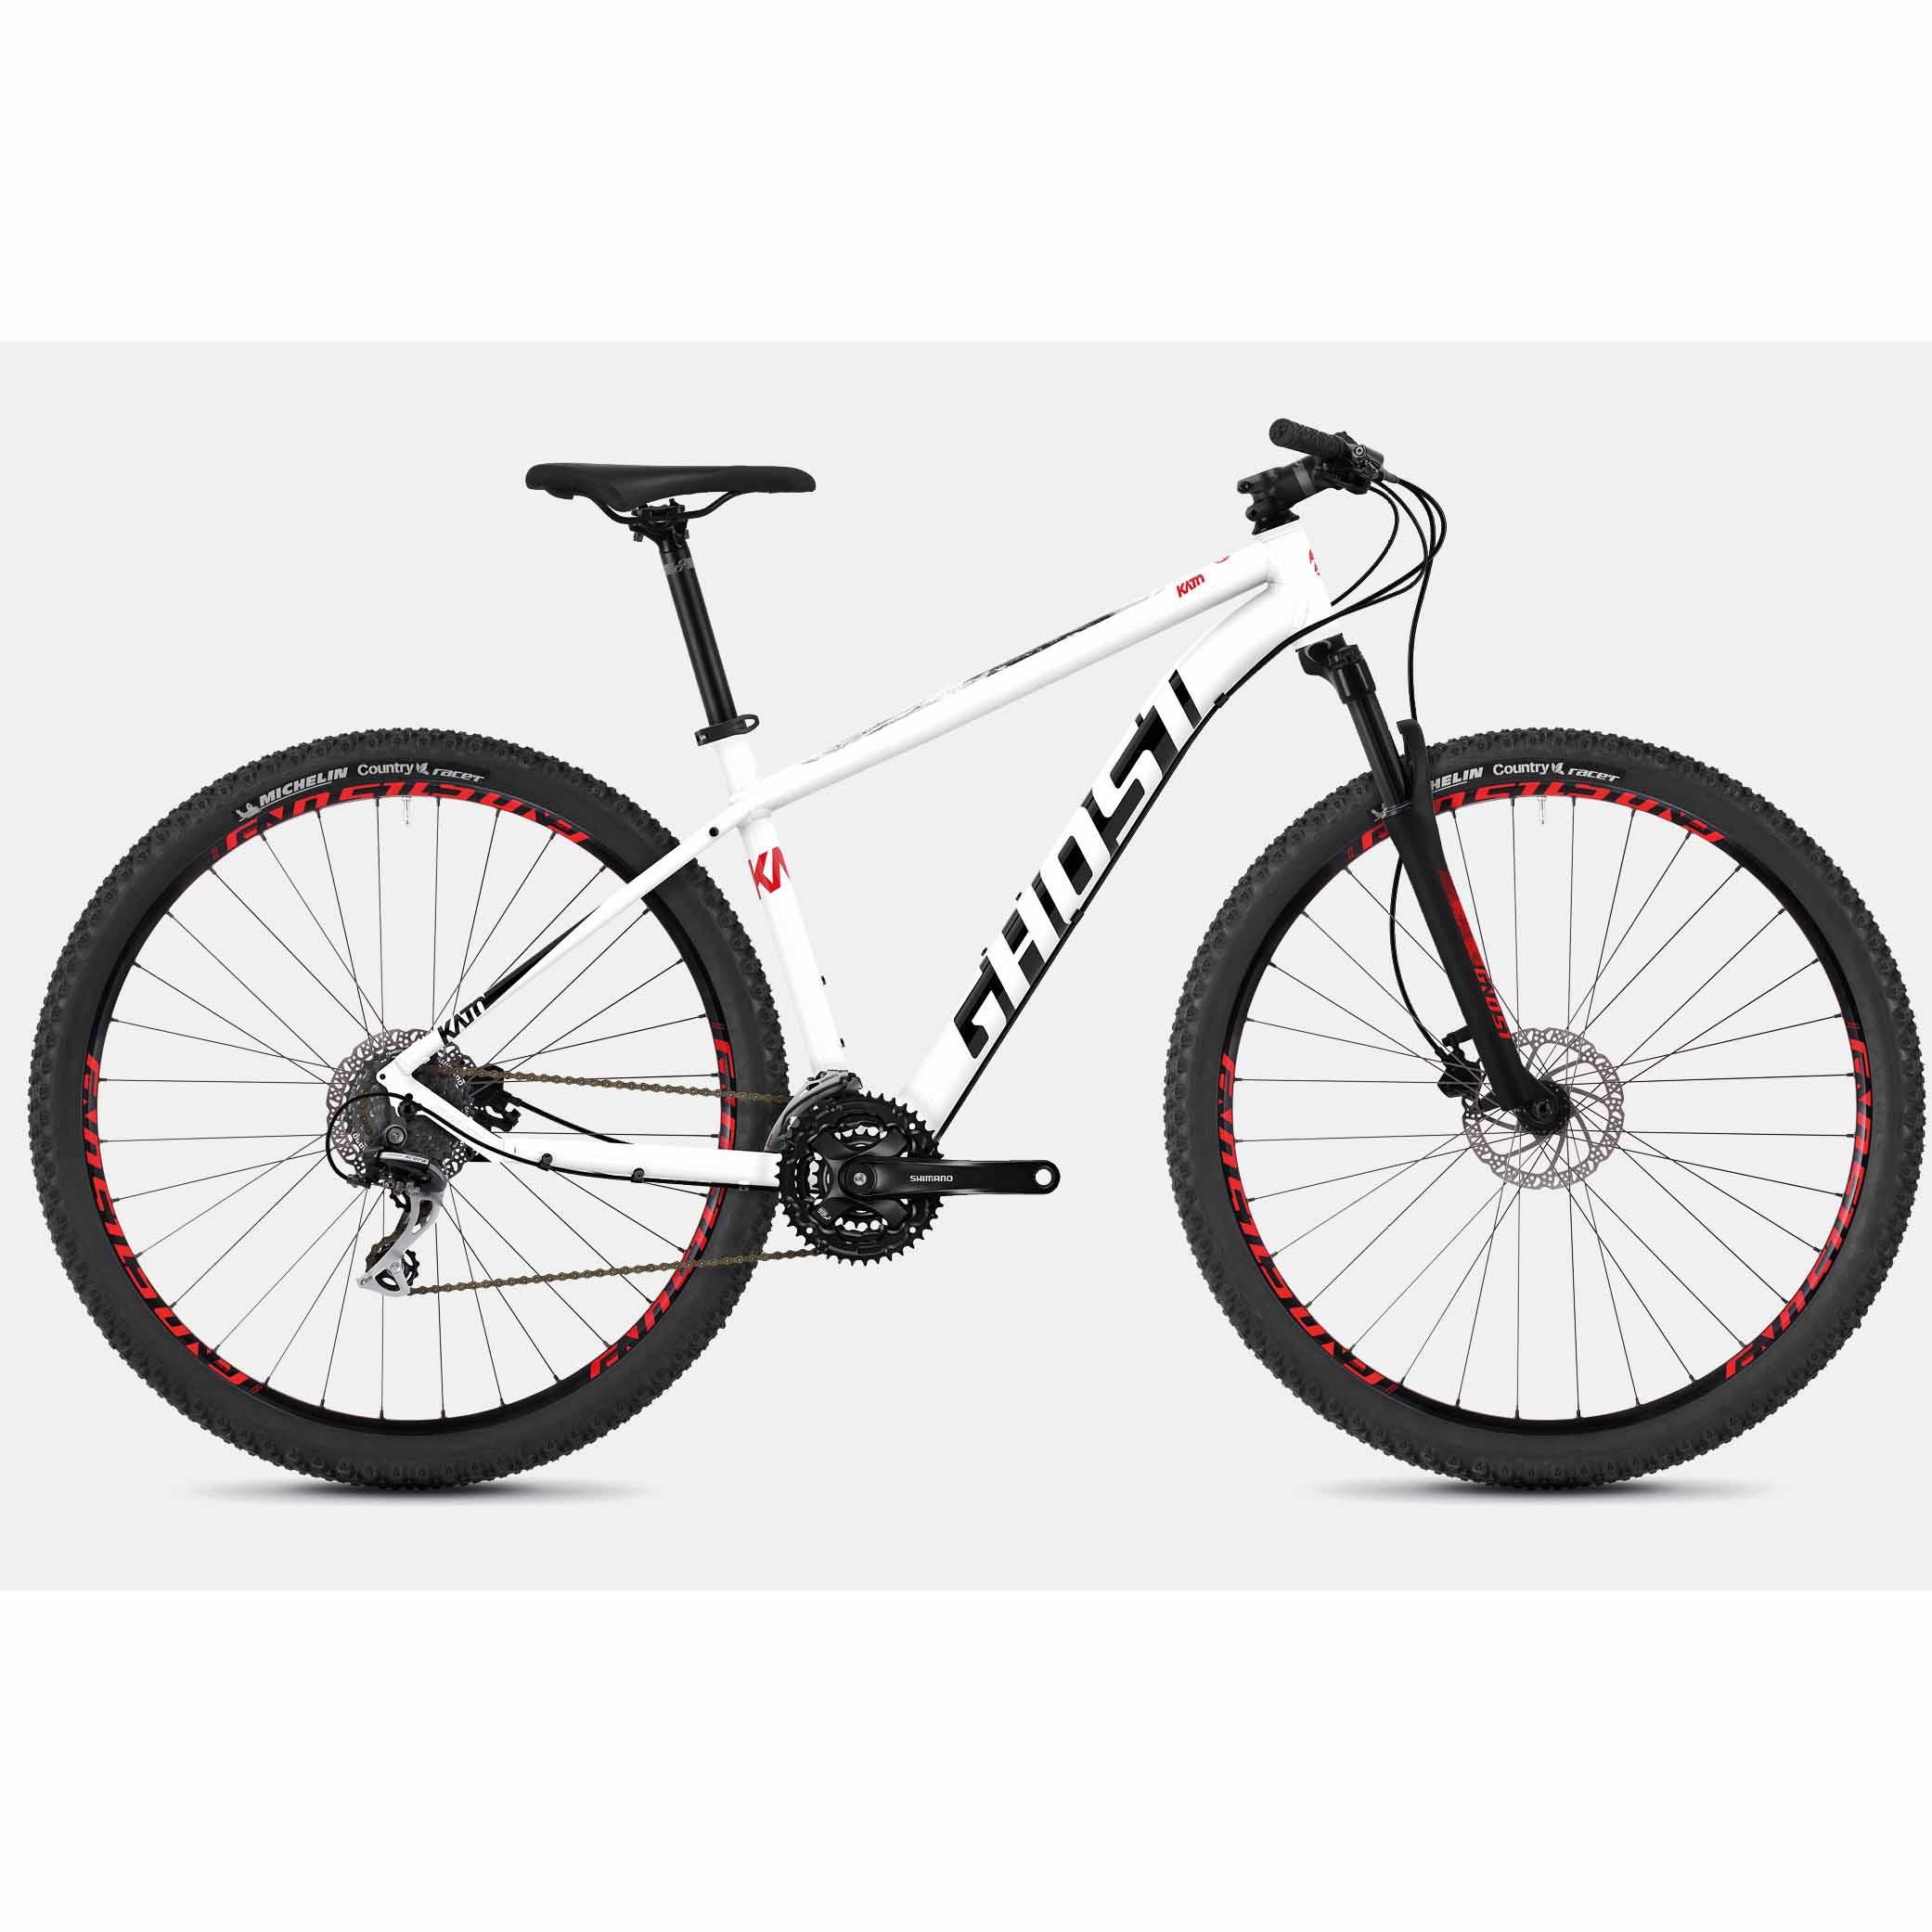 Фото Велосипед Ghost Kato 3.9 29″,  рама XL,  бело-красно-черный, 2019